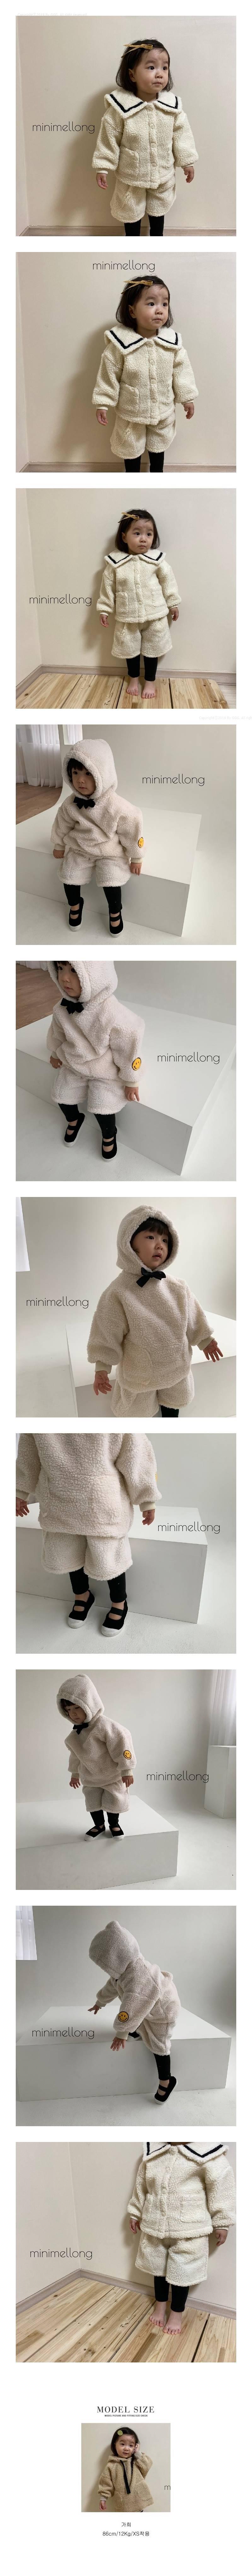 MINIMELLONG - Korean Children Fashion - #Kfashion4kids - Dumble Pants Leggings